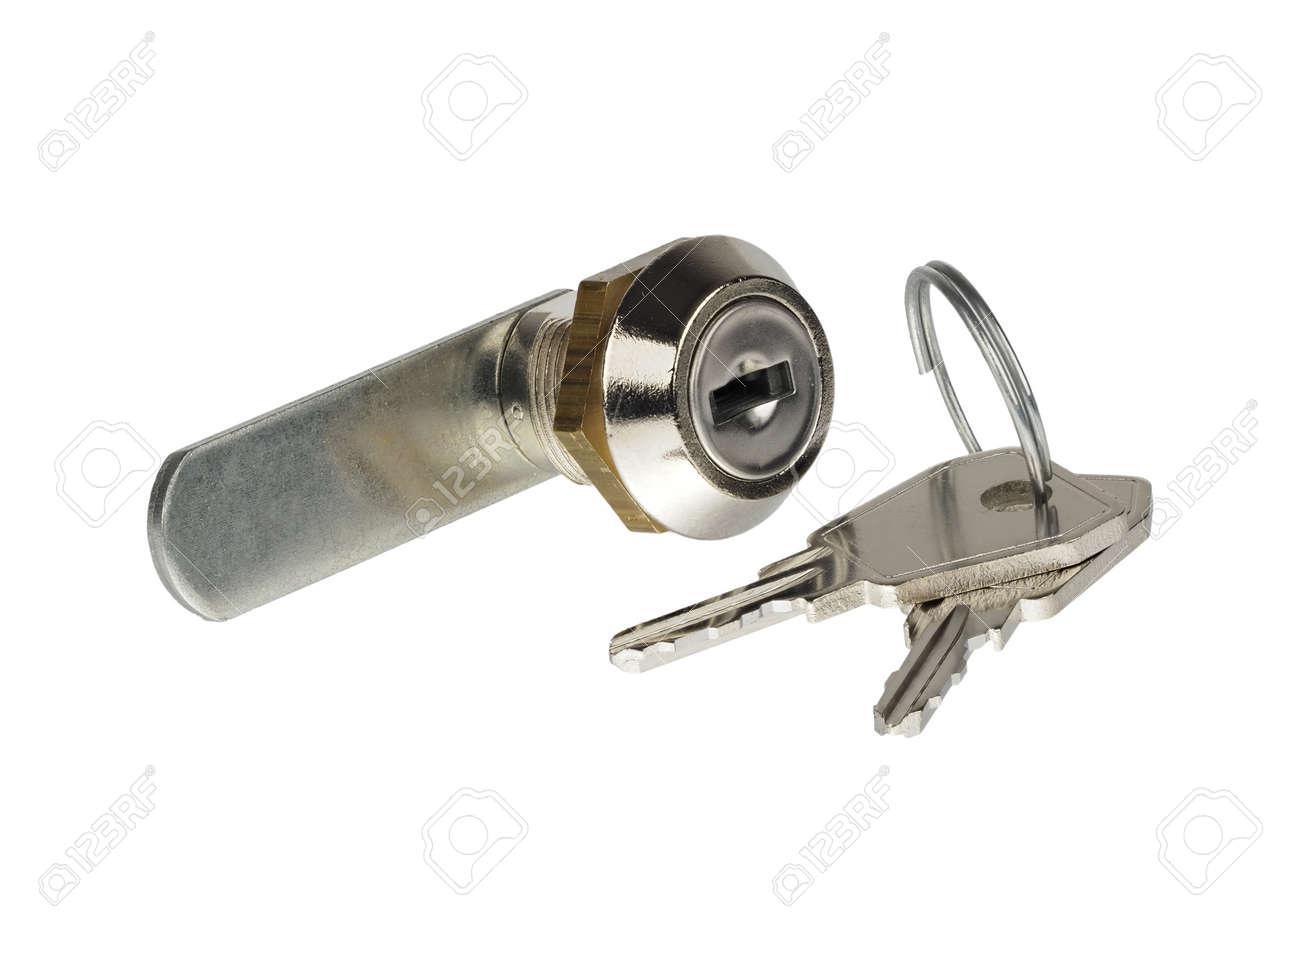 Letterbox locking cylinder and keys isolated on white background - 171081066